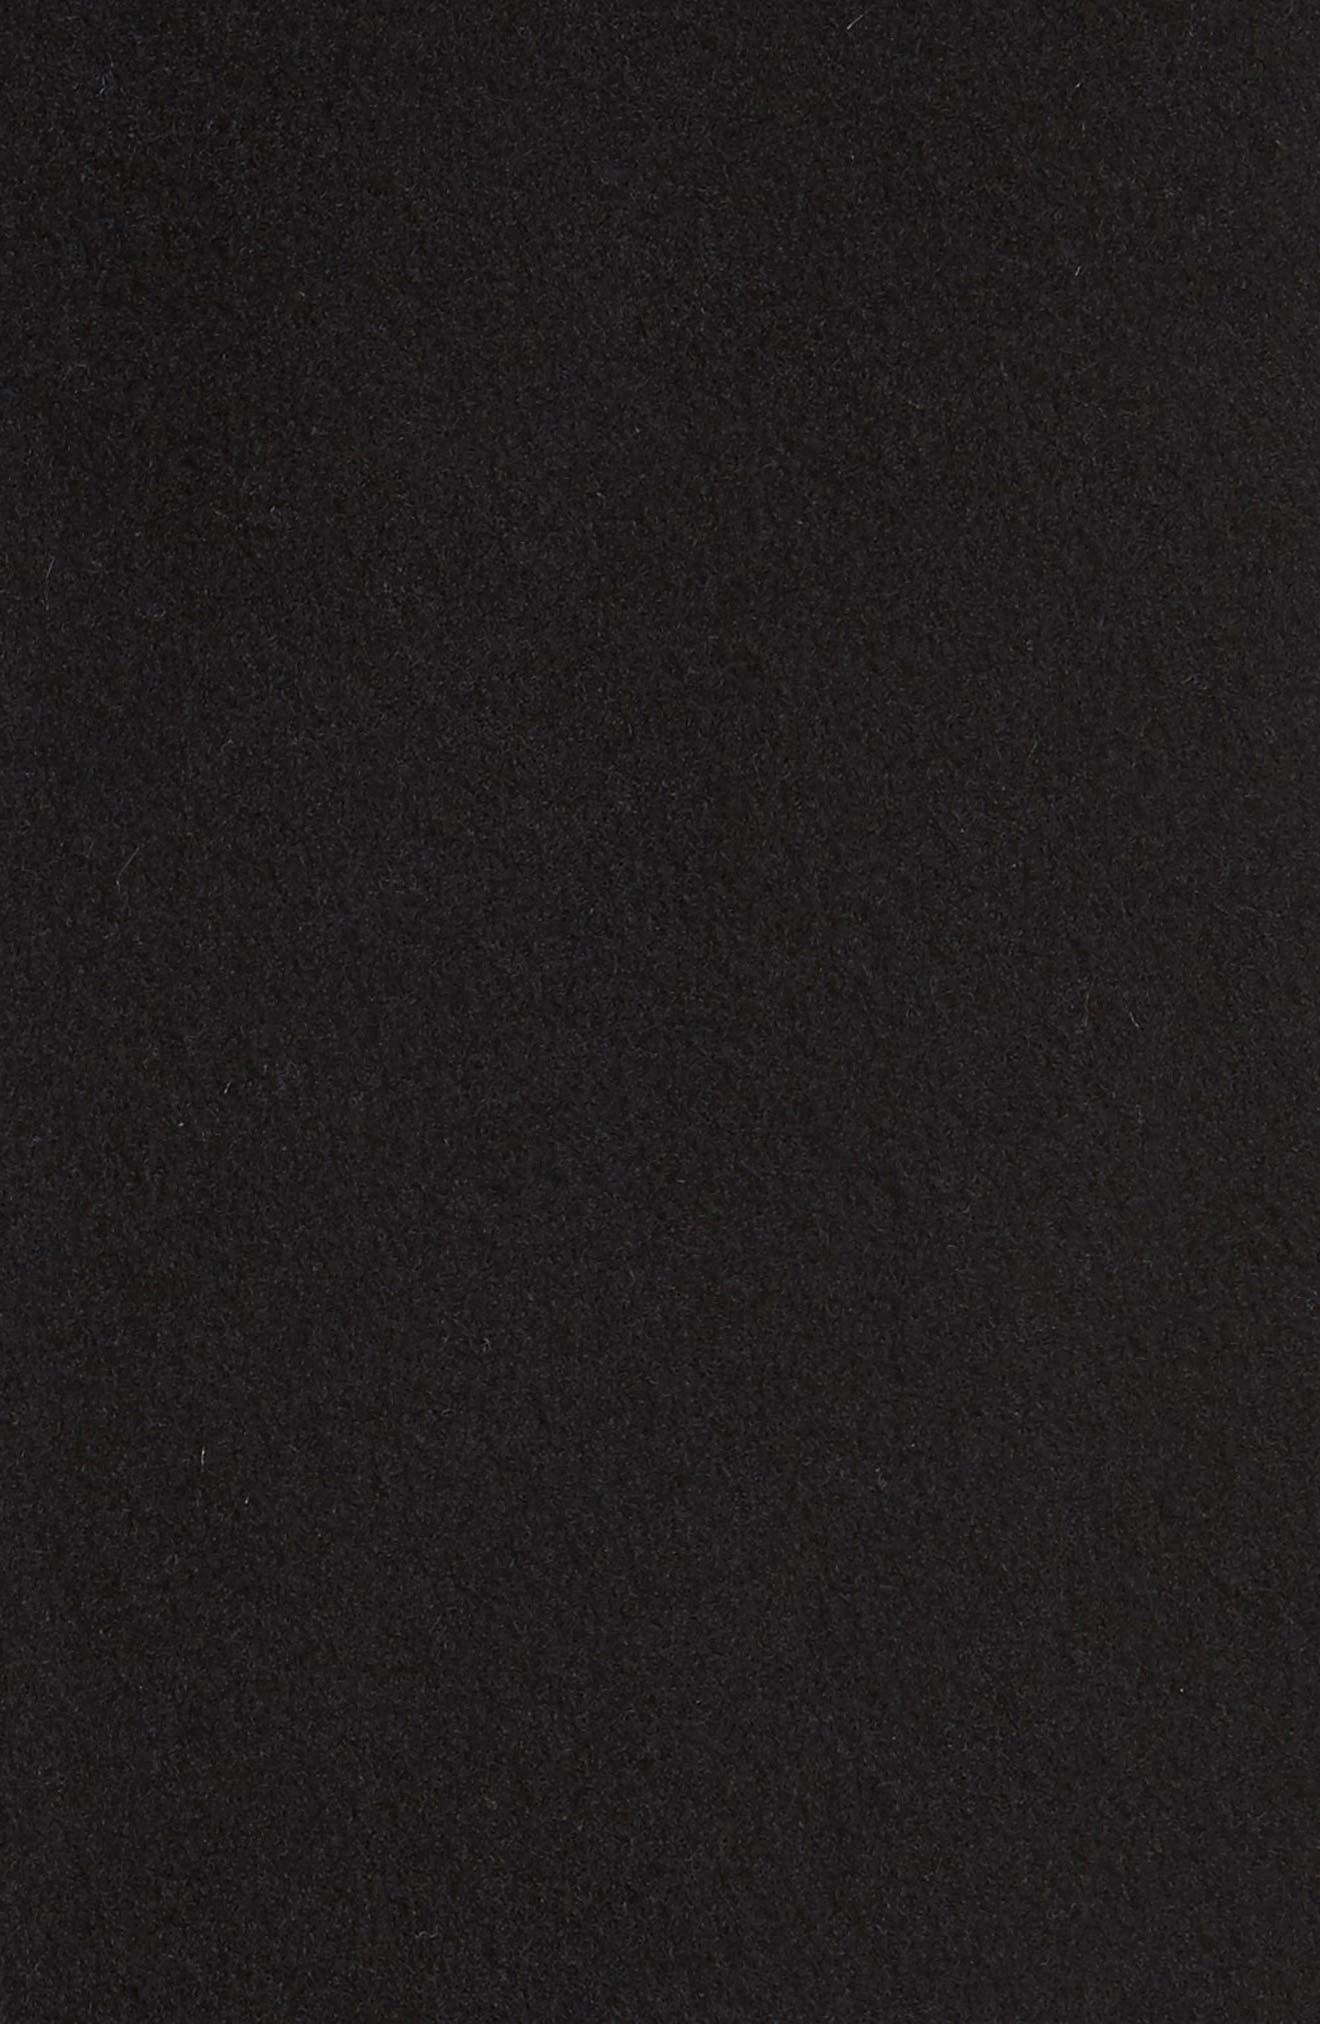 Wool & Cashmere Car Coat,                             Alternate thumbnail 6, color,                             001